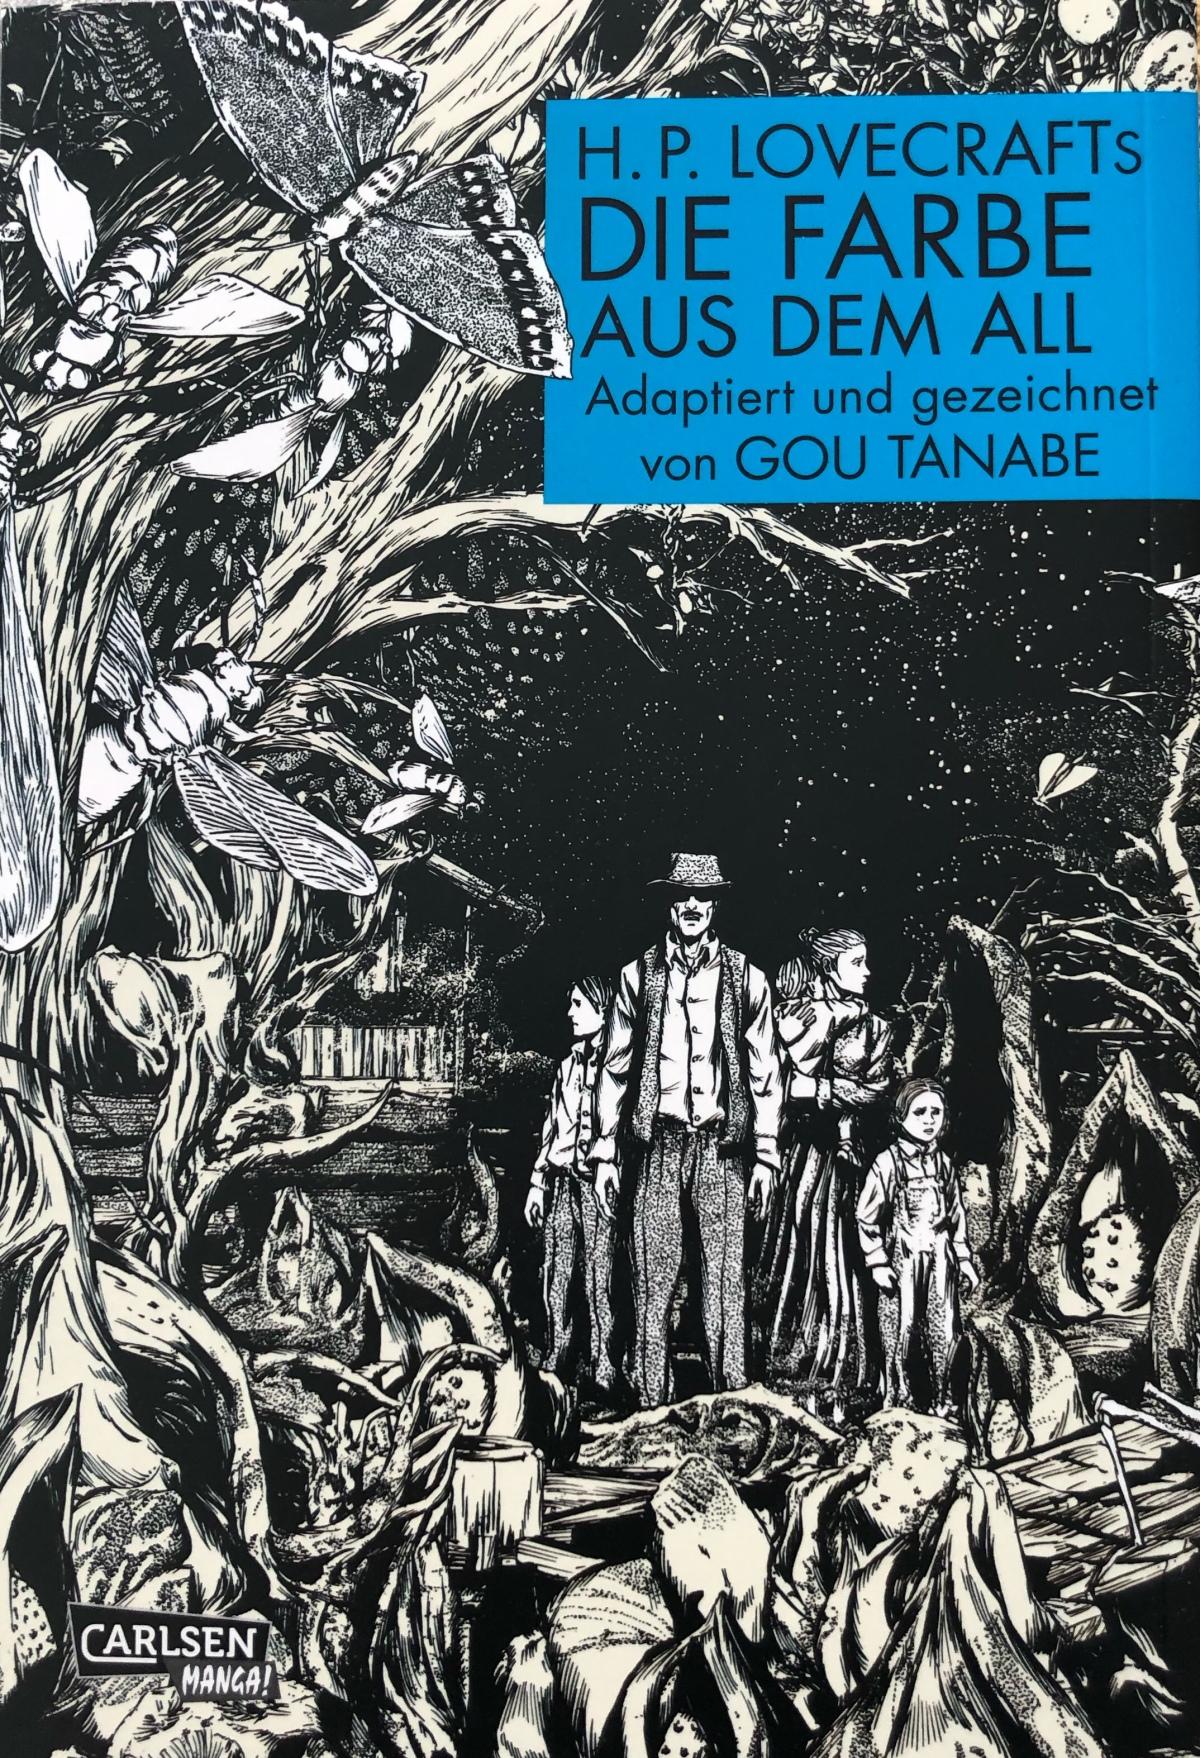 H. P. Lovecrafts Die Farbe aus dem All (Manga) | Review [Rezensionsexemplar]